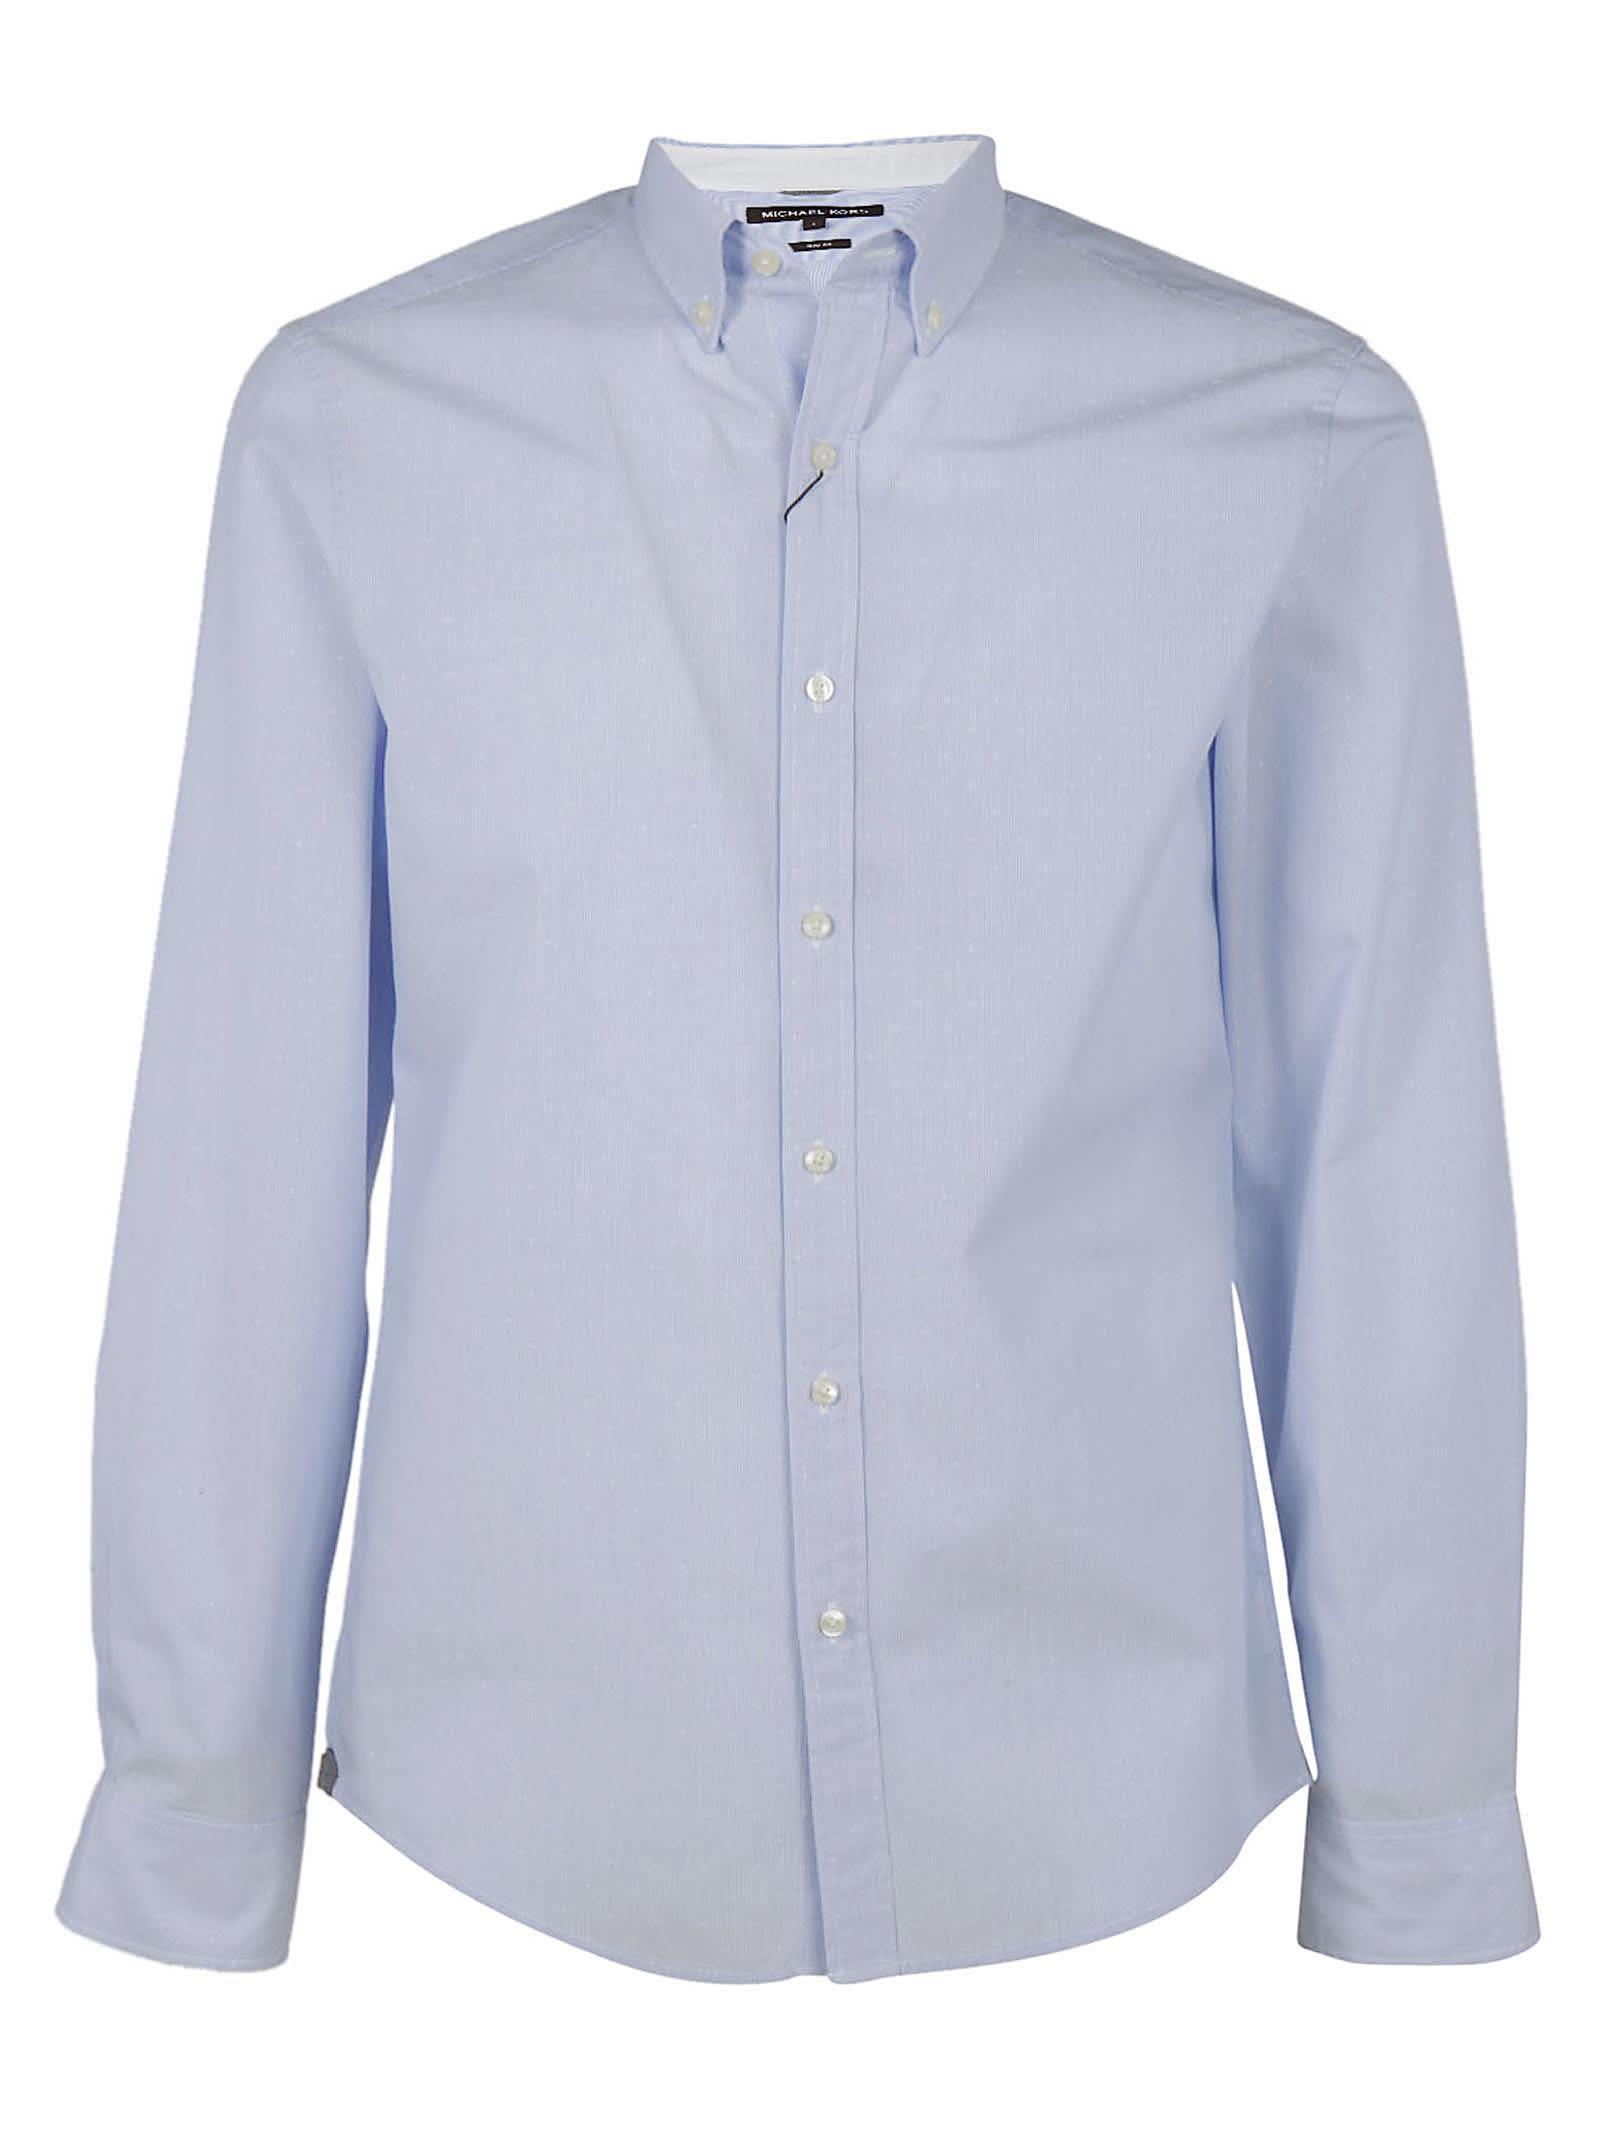 Michael Kors Stripe Shirt